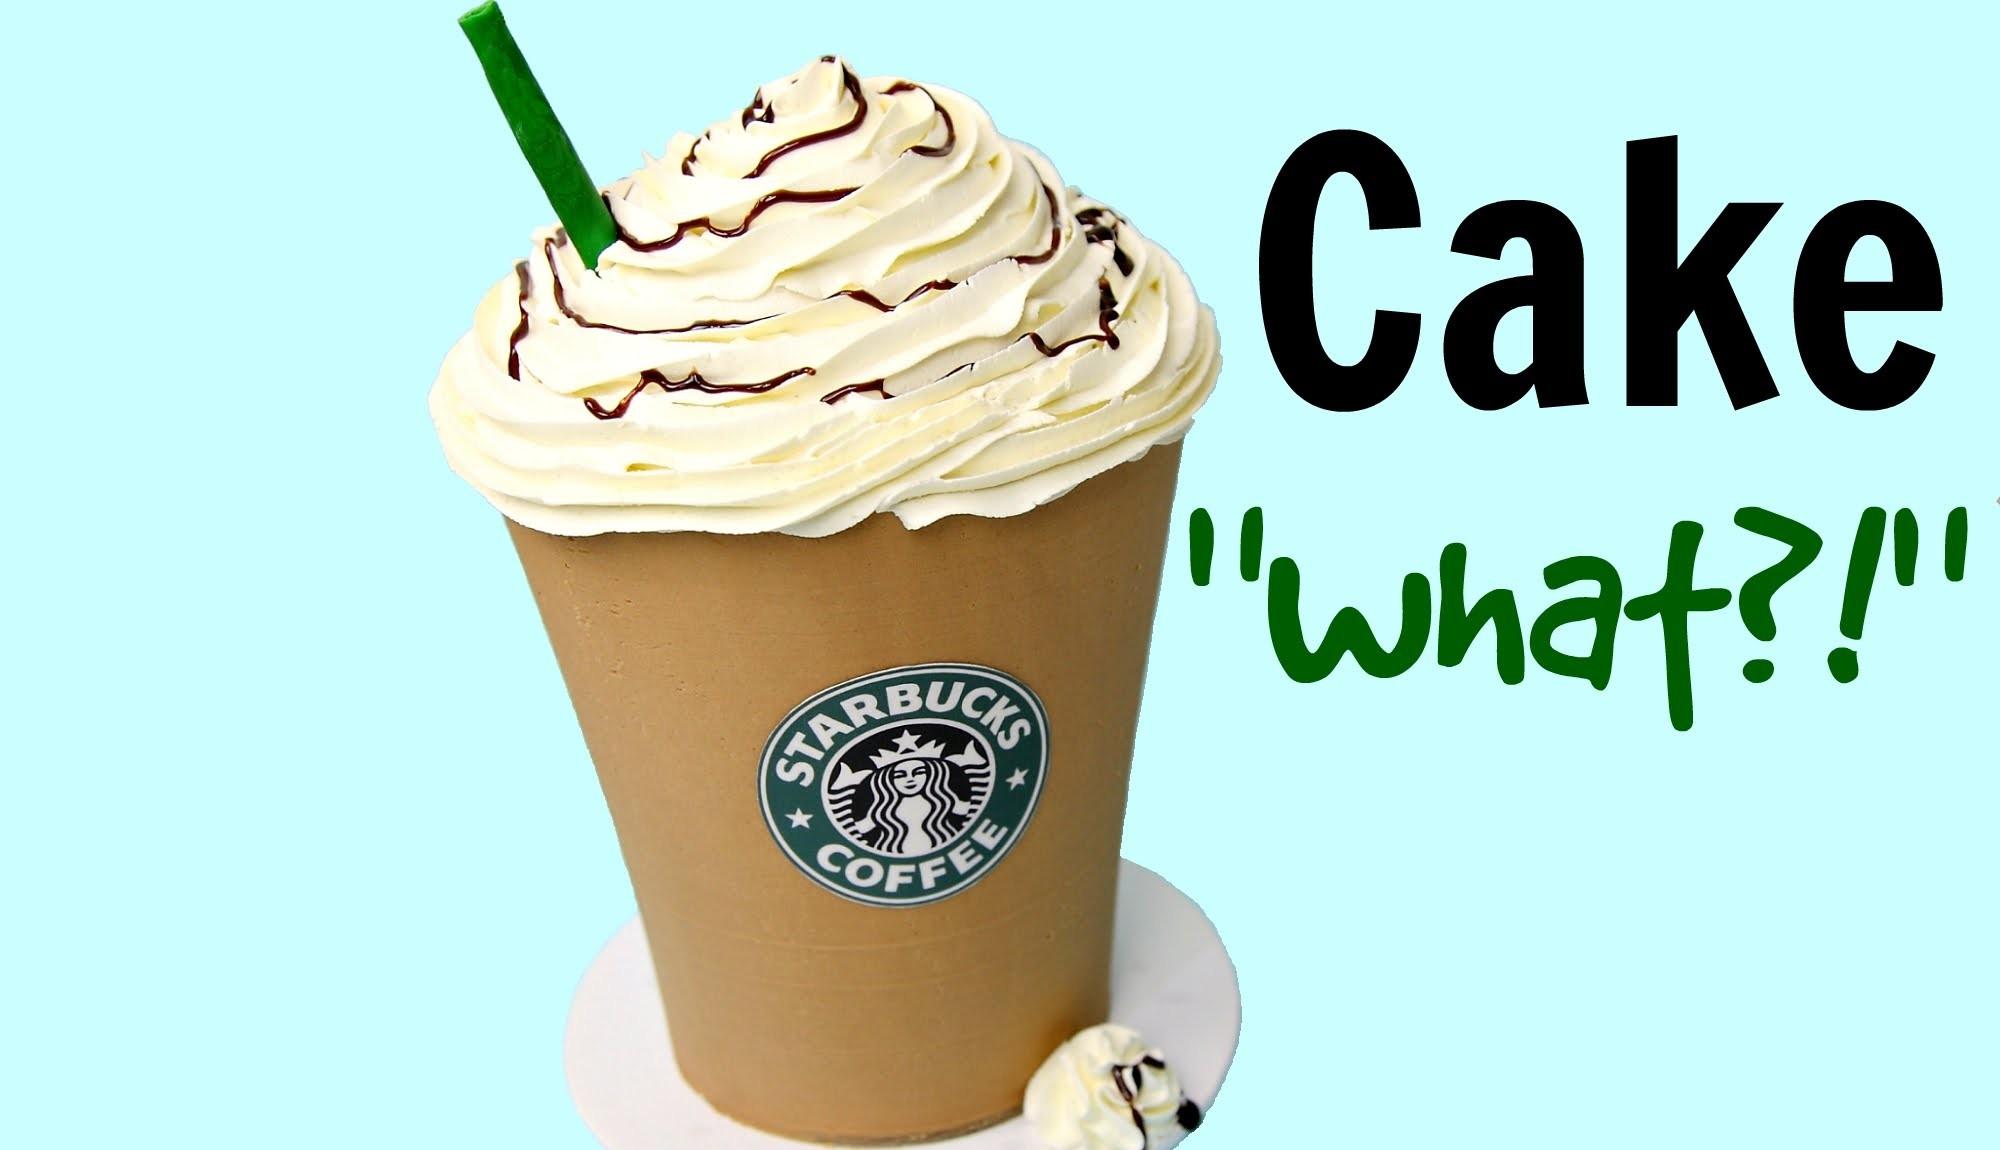 Starbucks Mocha Frappuccino Cake - CAKE STYLE